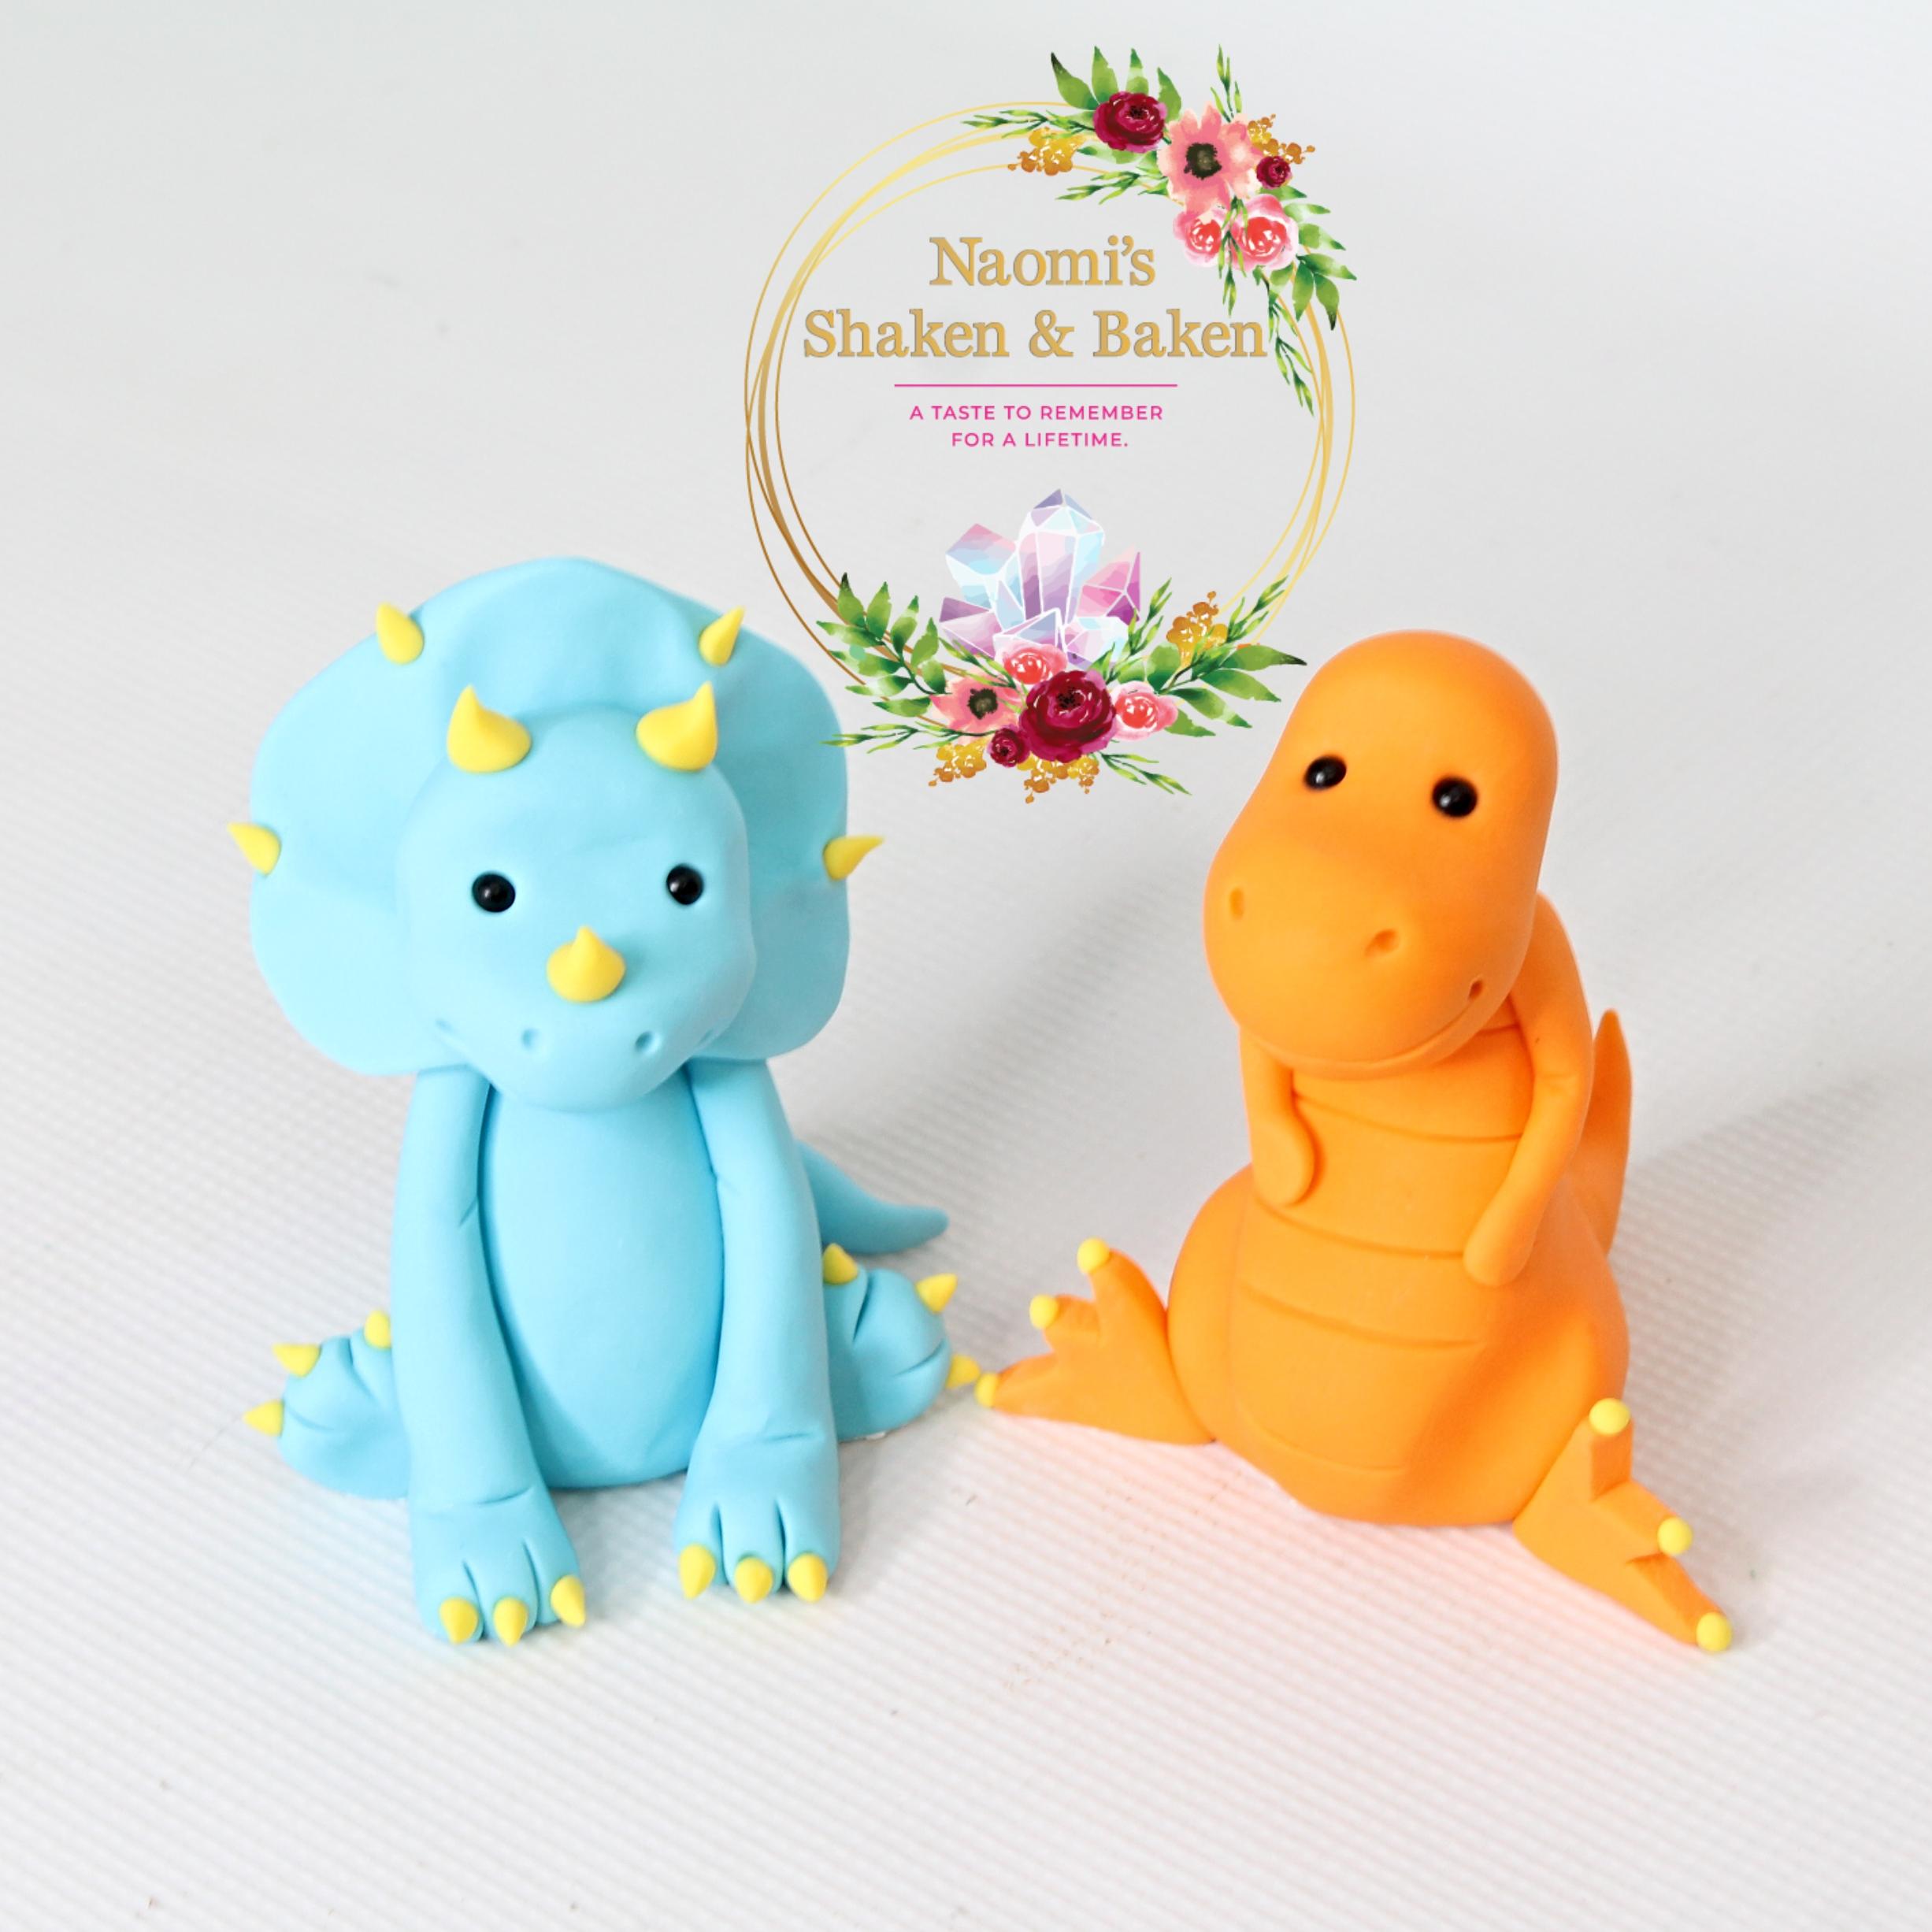 Cute Edible Fondant Dinosaur Cake Toppers